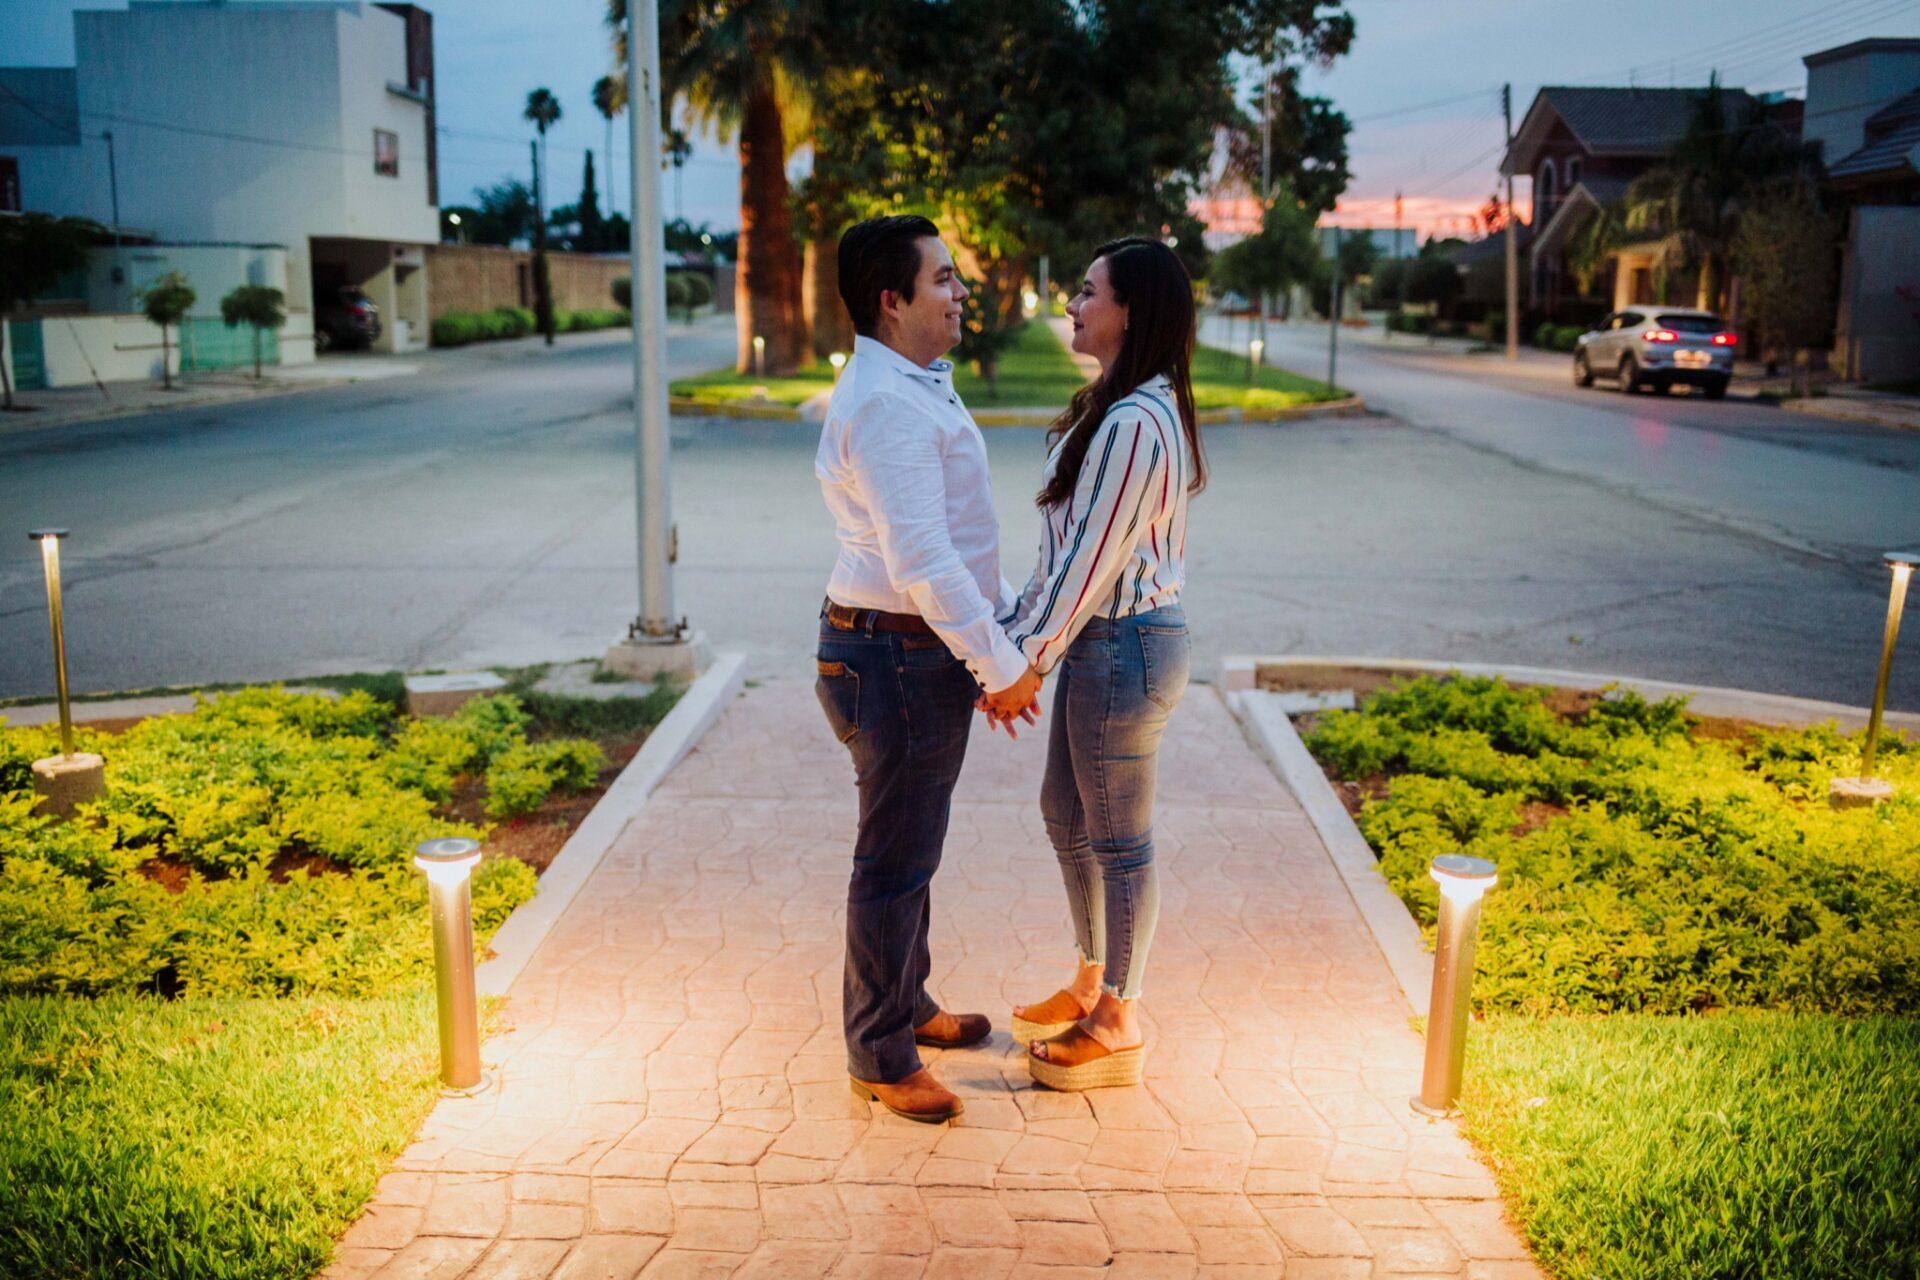 javier_noriega_fotografo_bodas_save_the_date_preboda_torreon_coahuila_zacatecas_wedding_photographer4